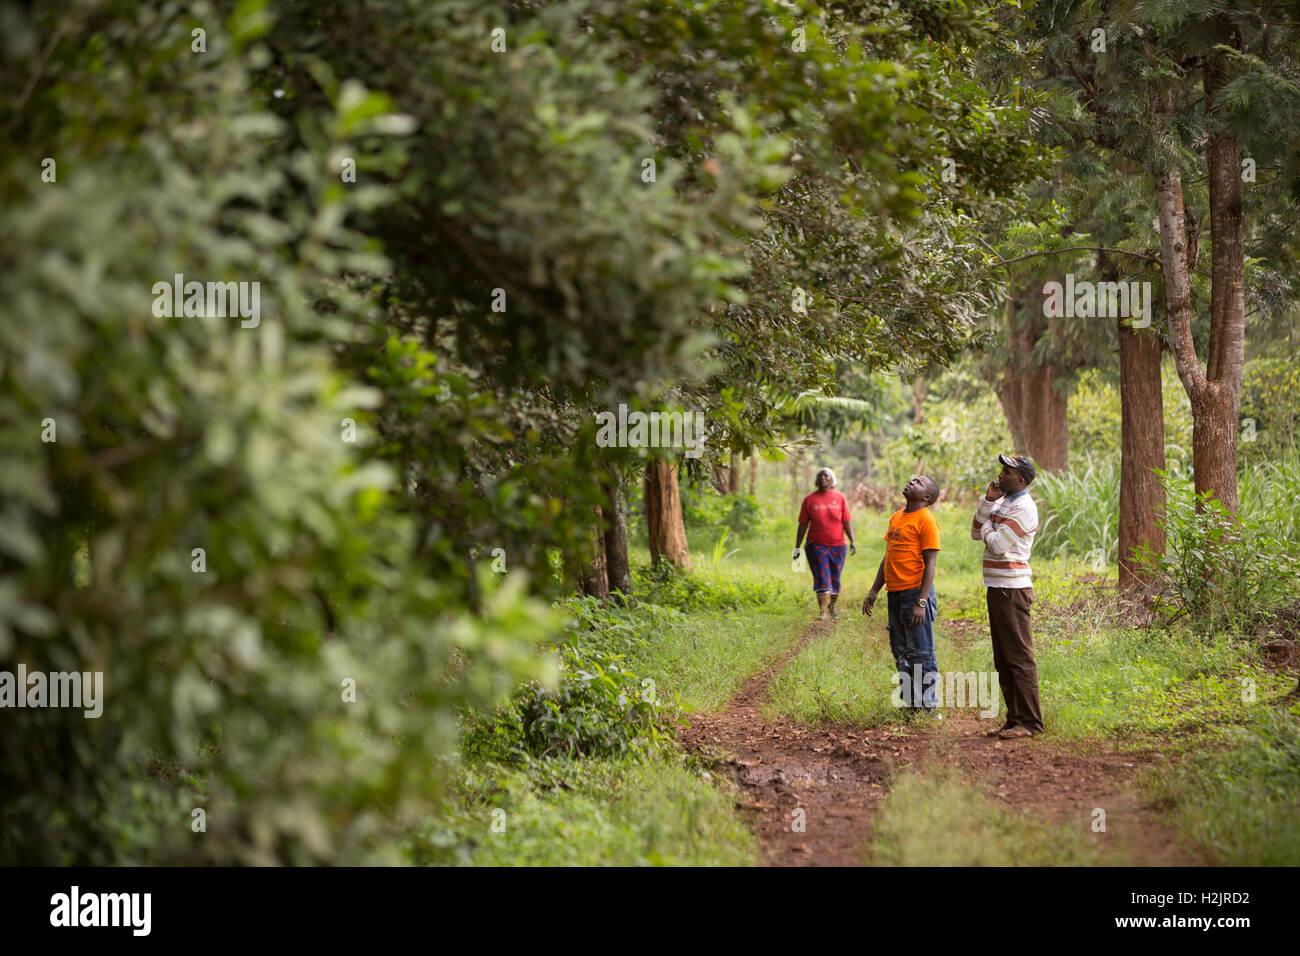 Fair trade producers survey a grove of Macadamia nut trees in Kirinyaga County, Kenya. - Stock Image